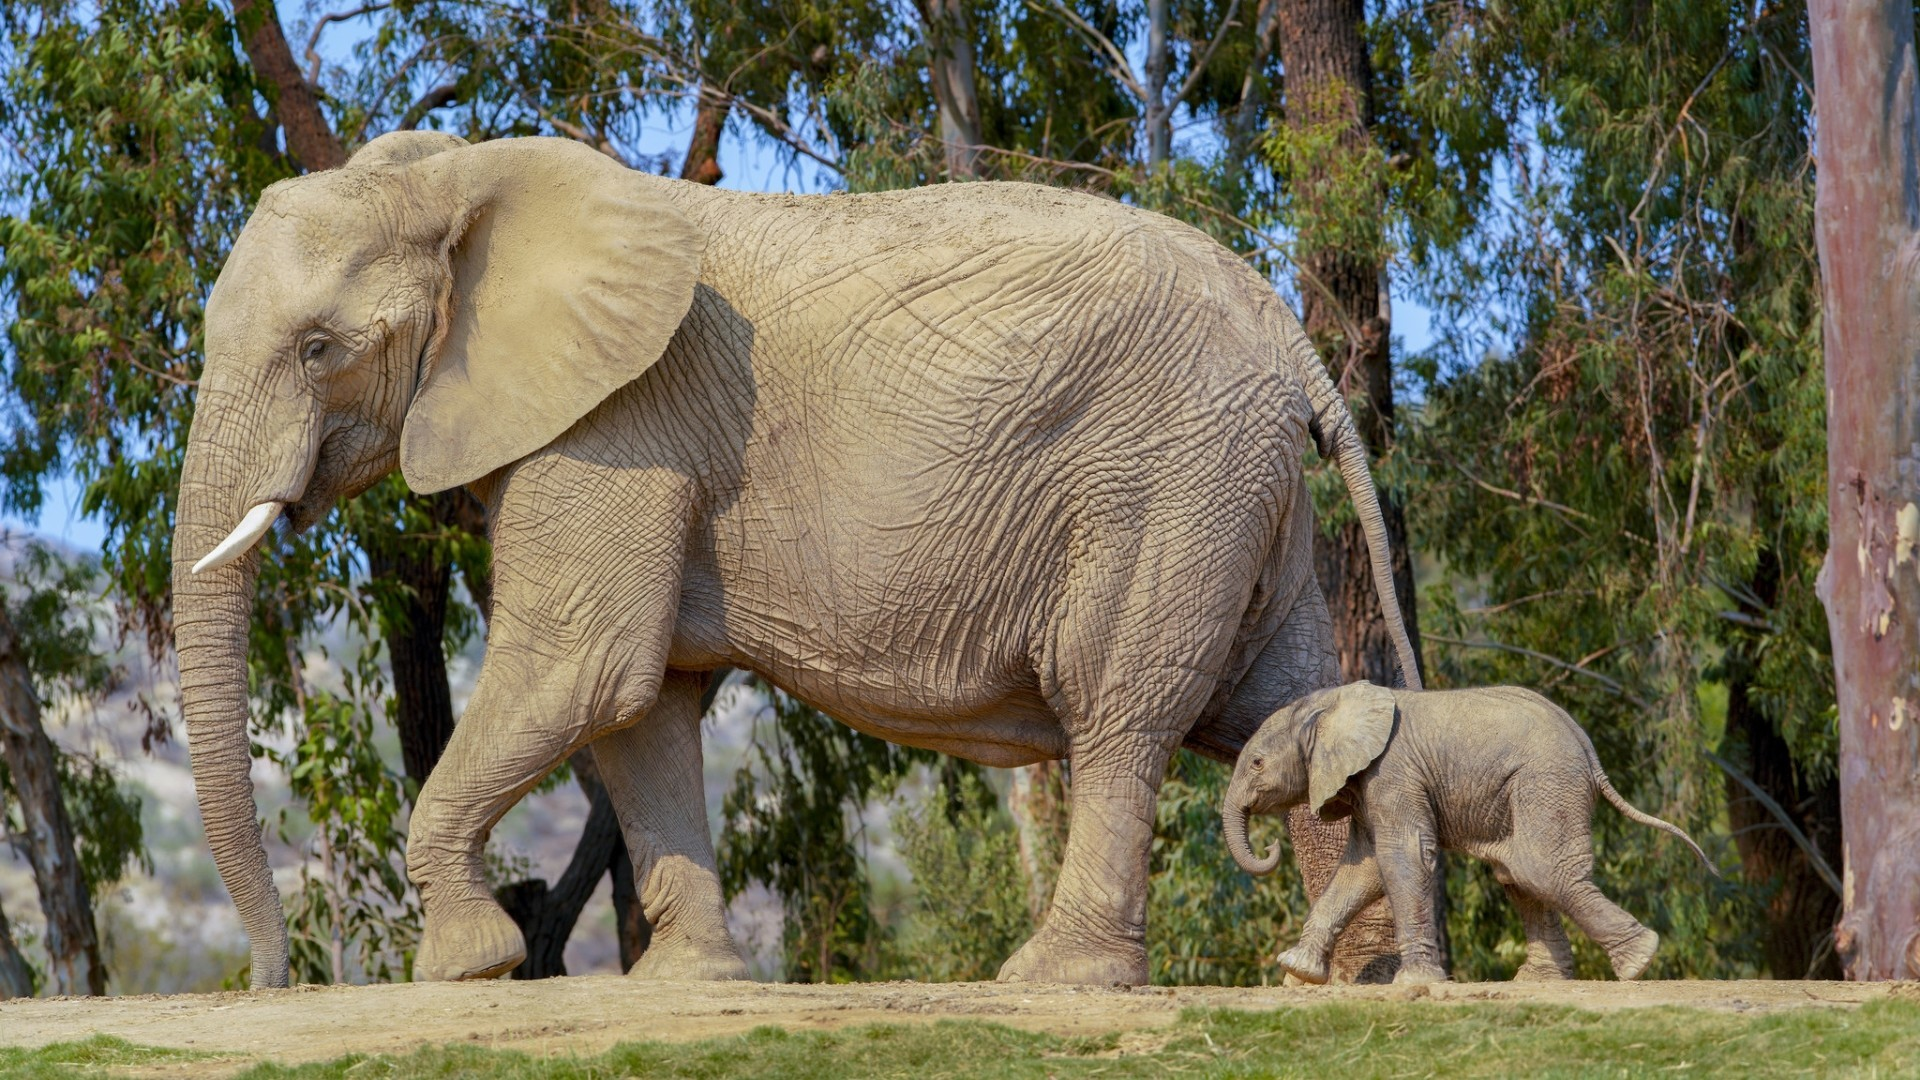 Baby Elephant Born on World Elephant Day at San Diego Zoo